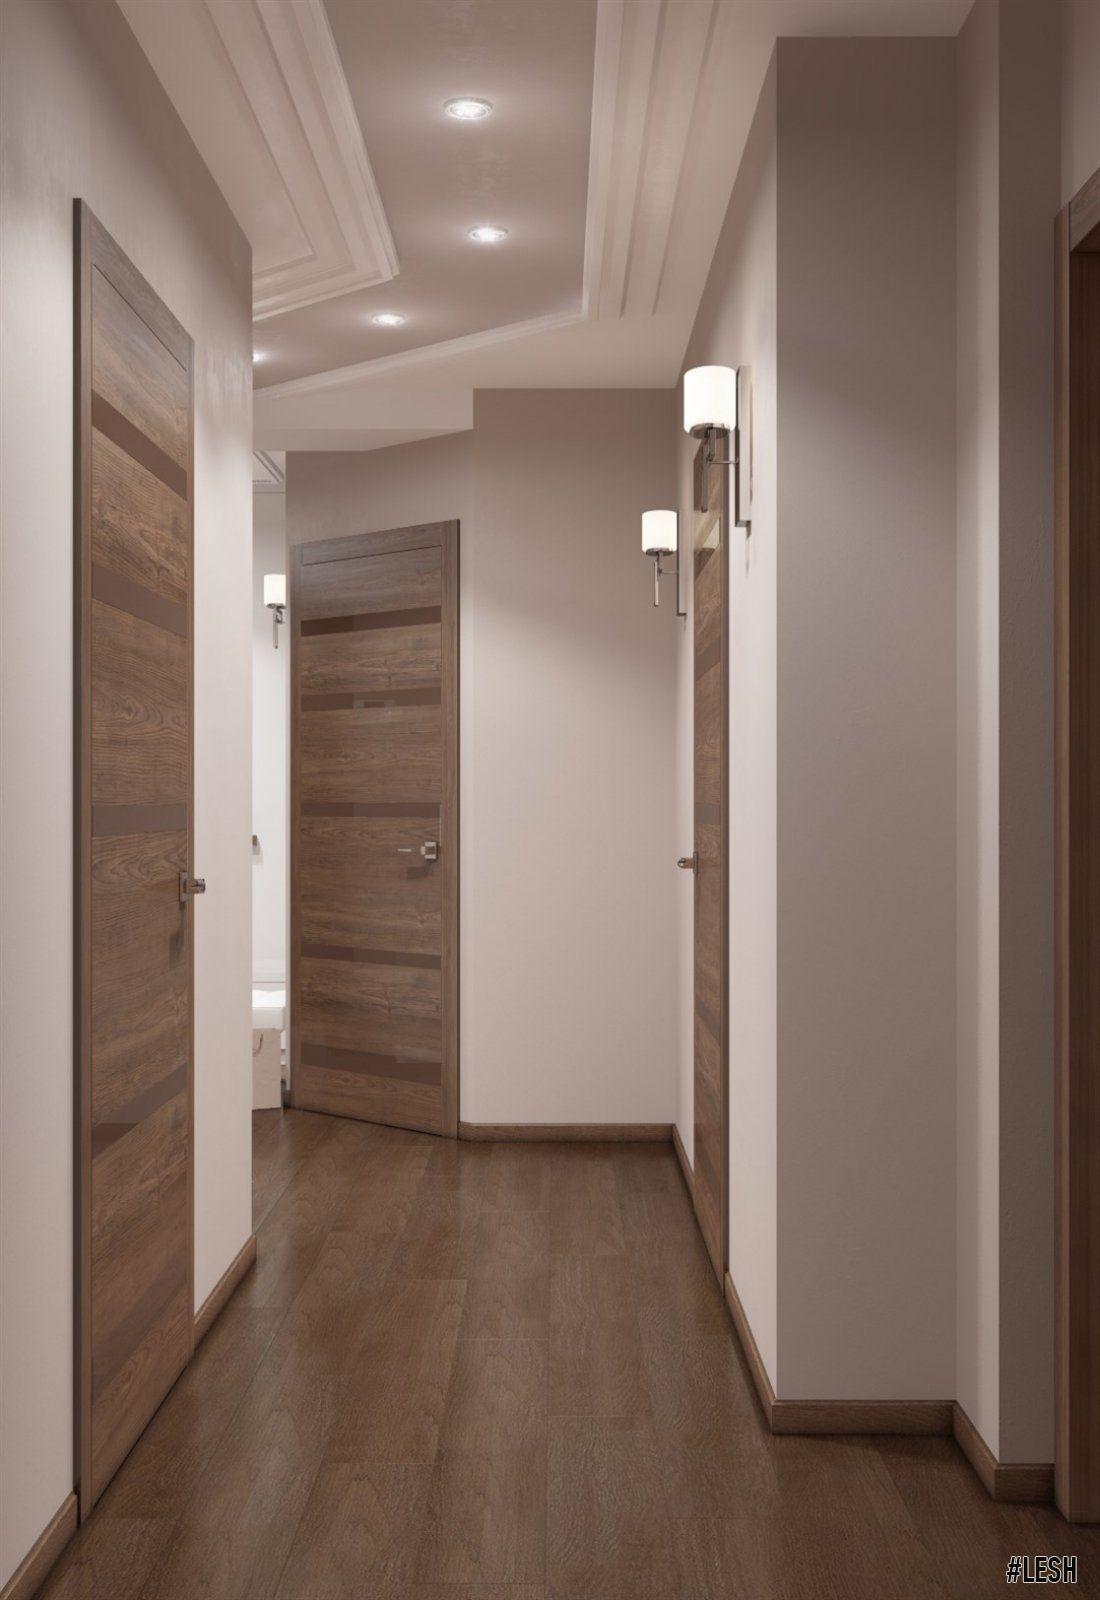 narrow hallway lighting ideas. narrow hallway lesh design project corridor idea interior lighting ideas